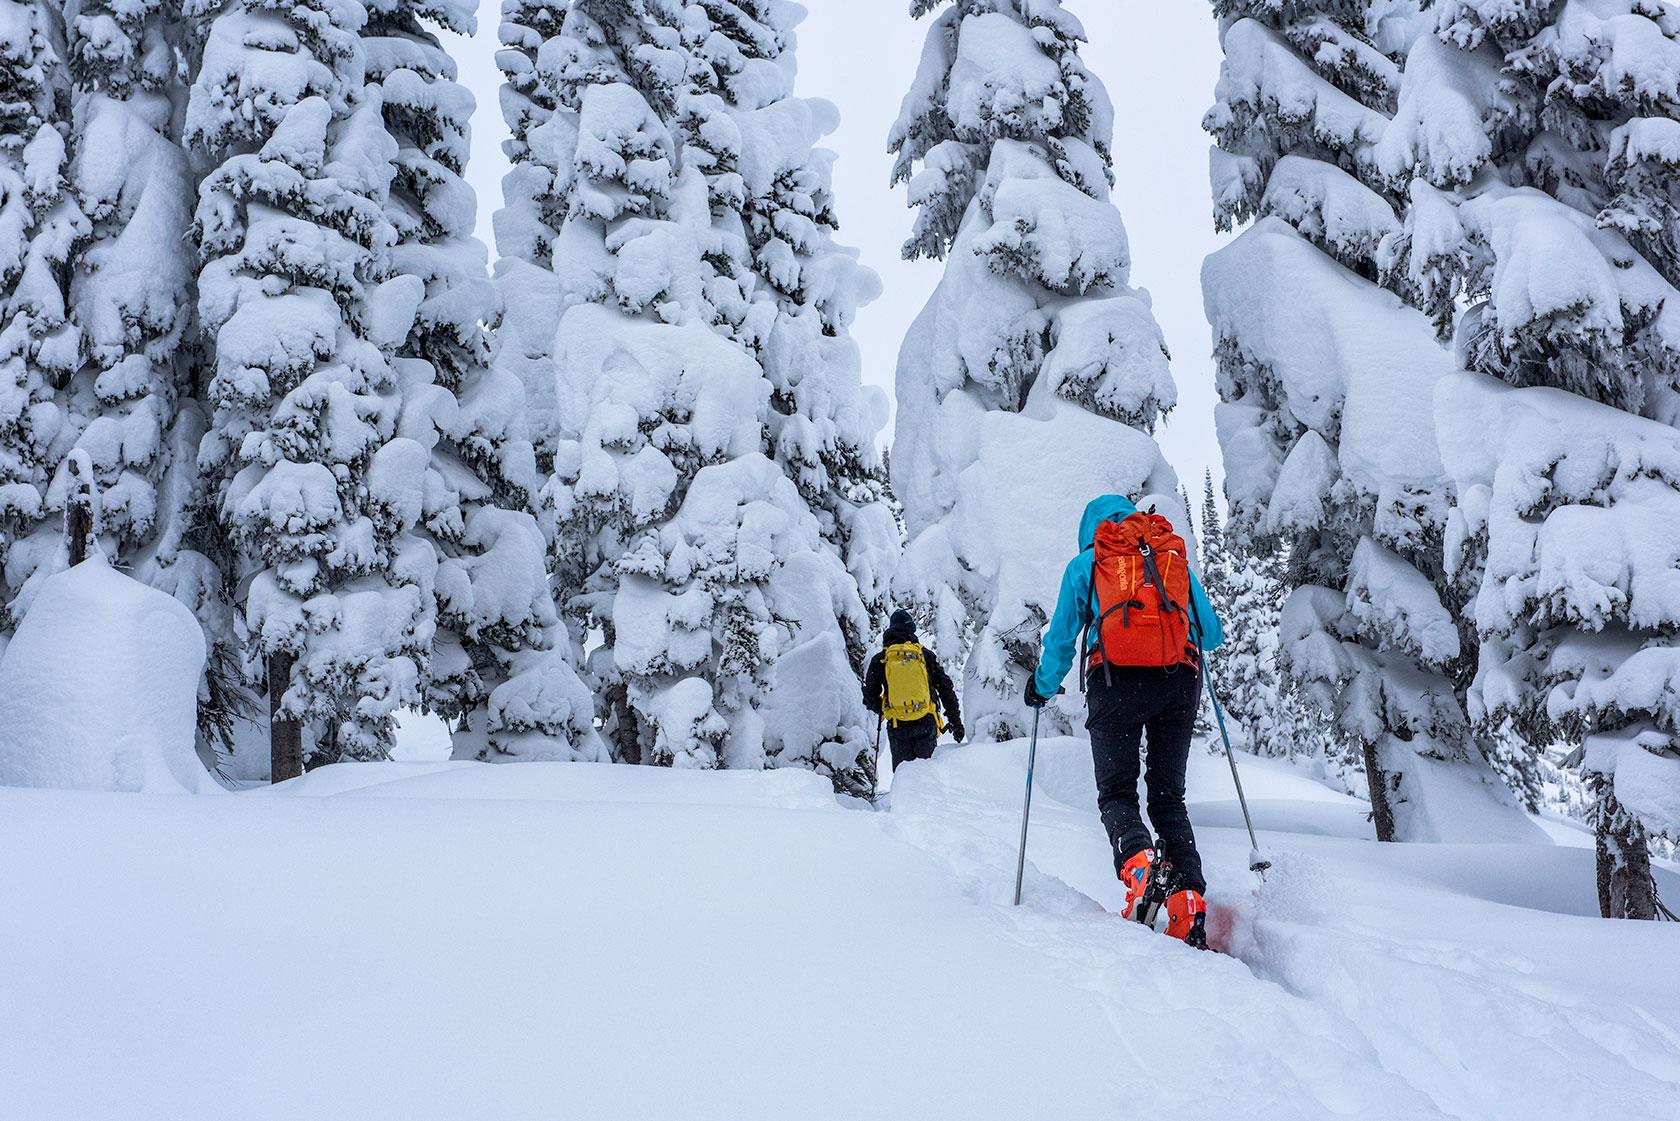 austin-trigg-patagonia-banff-alberta-winter-ski-tour-rogers-pass-powder-adventure.jpg